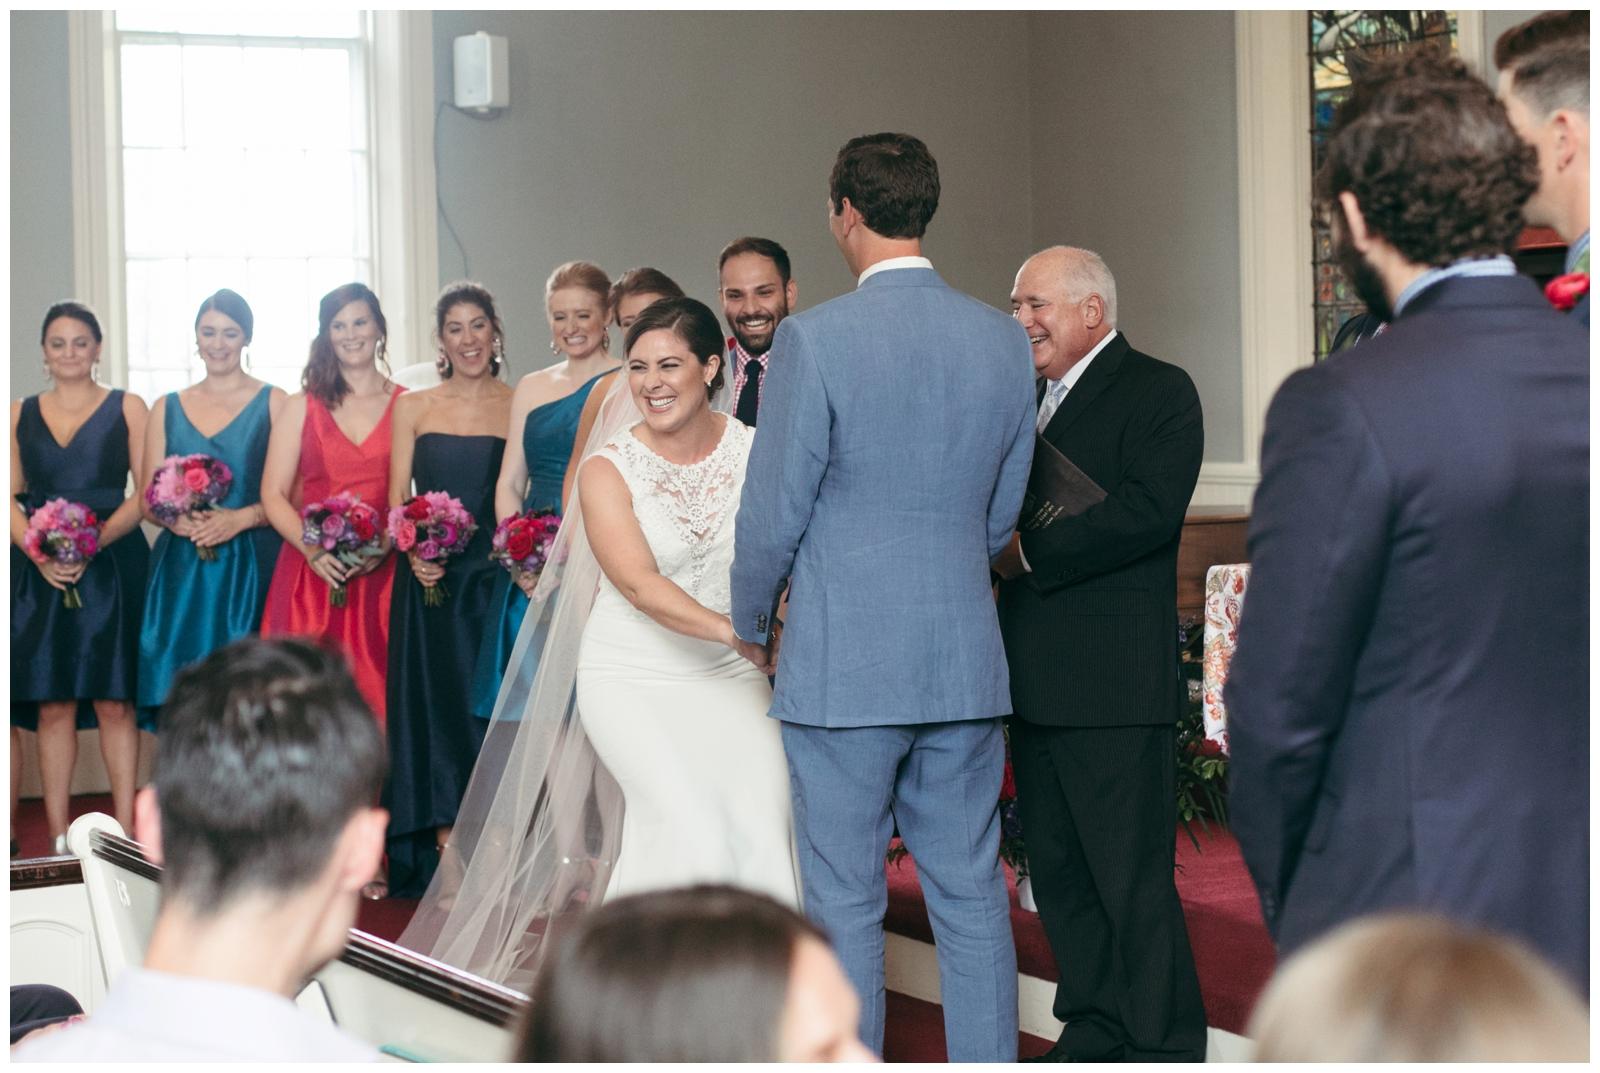 Bailey-Q-Photo-Backyard-Wedding-South-Shore-Boston-Wedding-Photographer-044.jpg